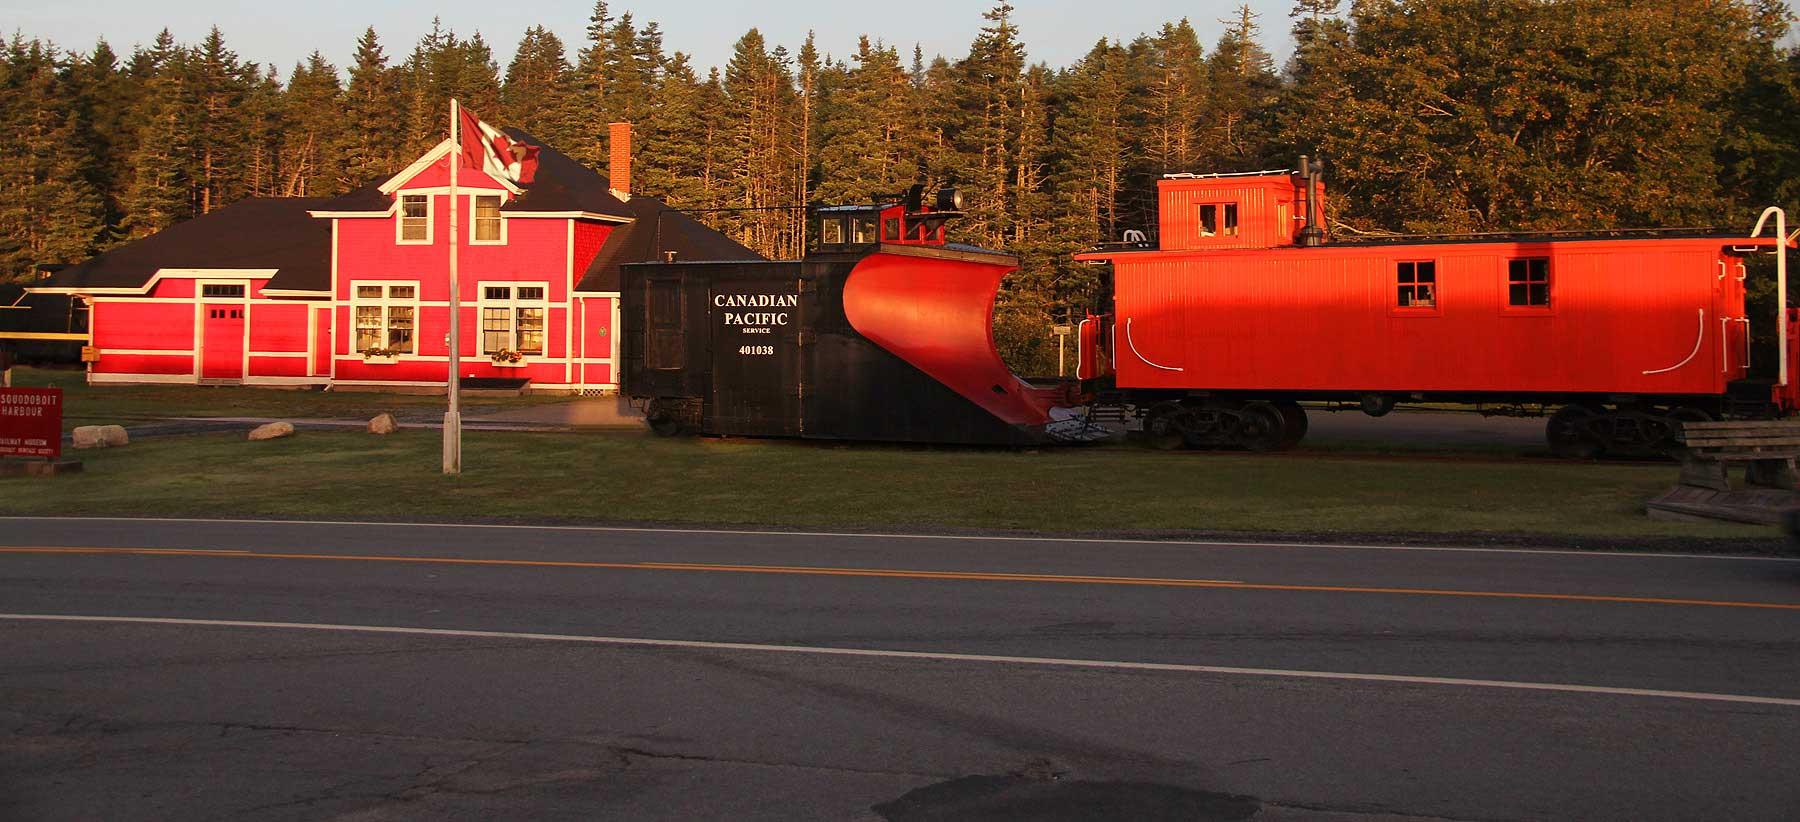 Musquodoboit Harbour Railway Museum